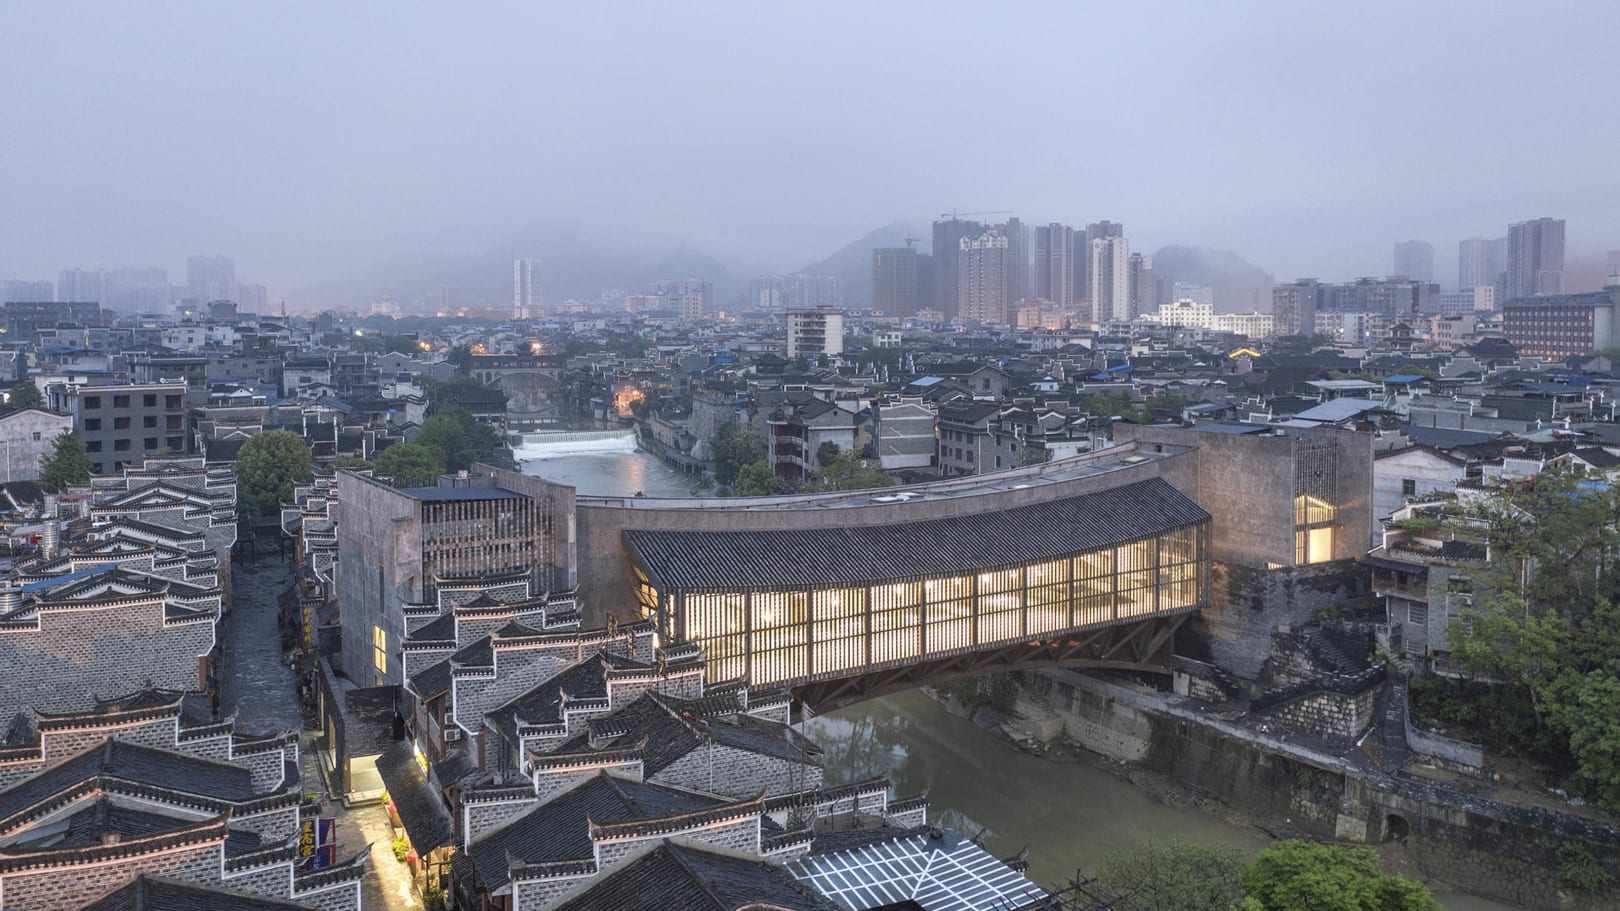 Jishou Art Museum